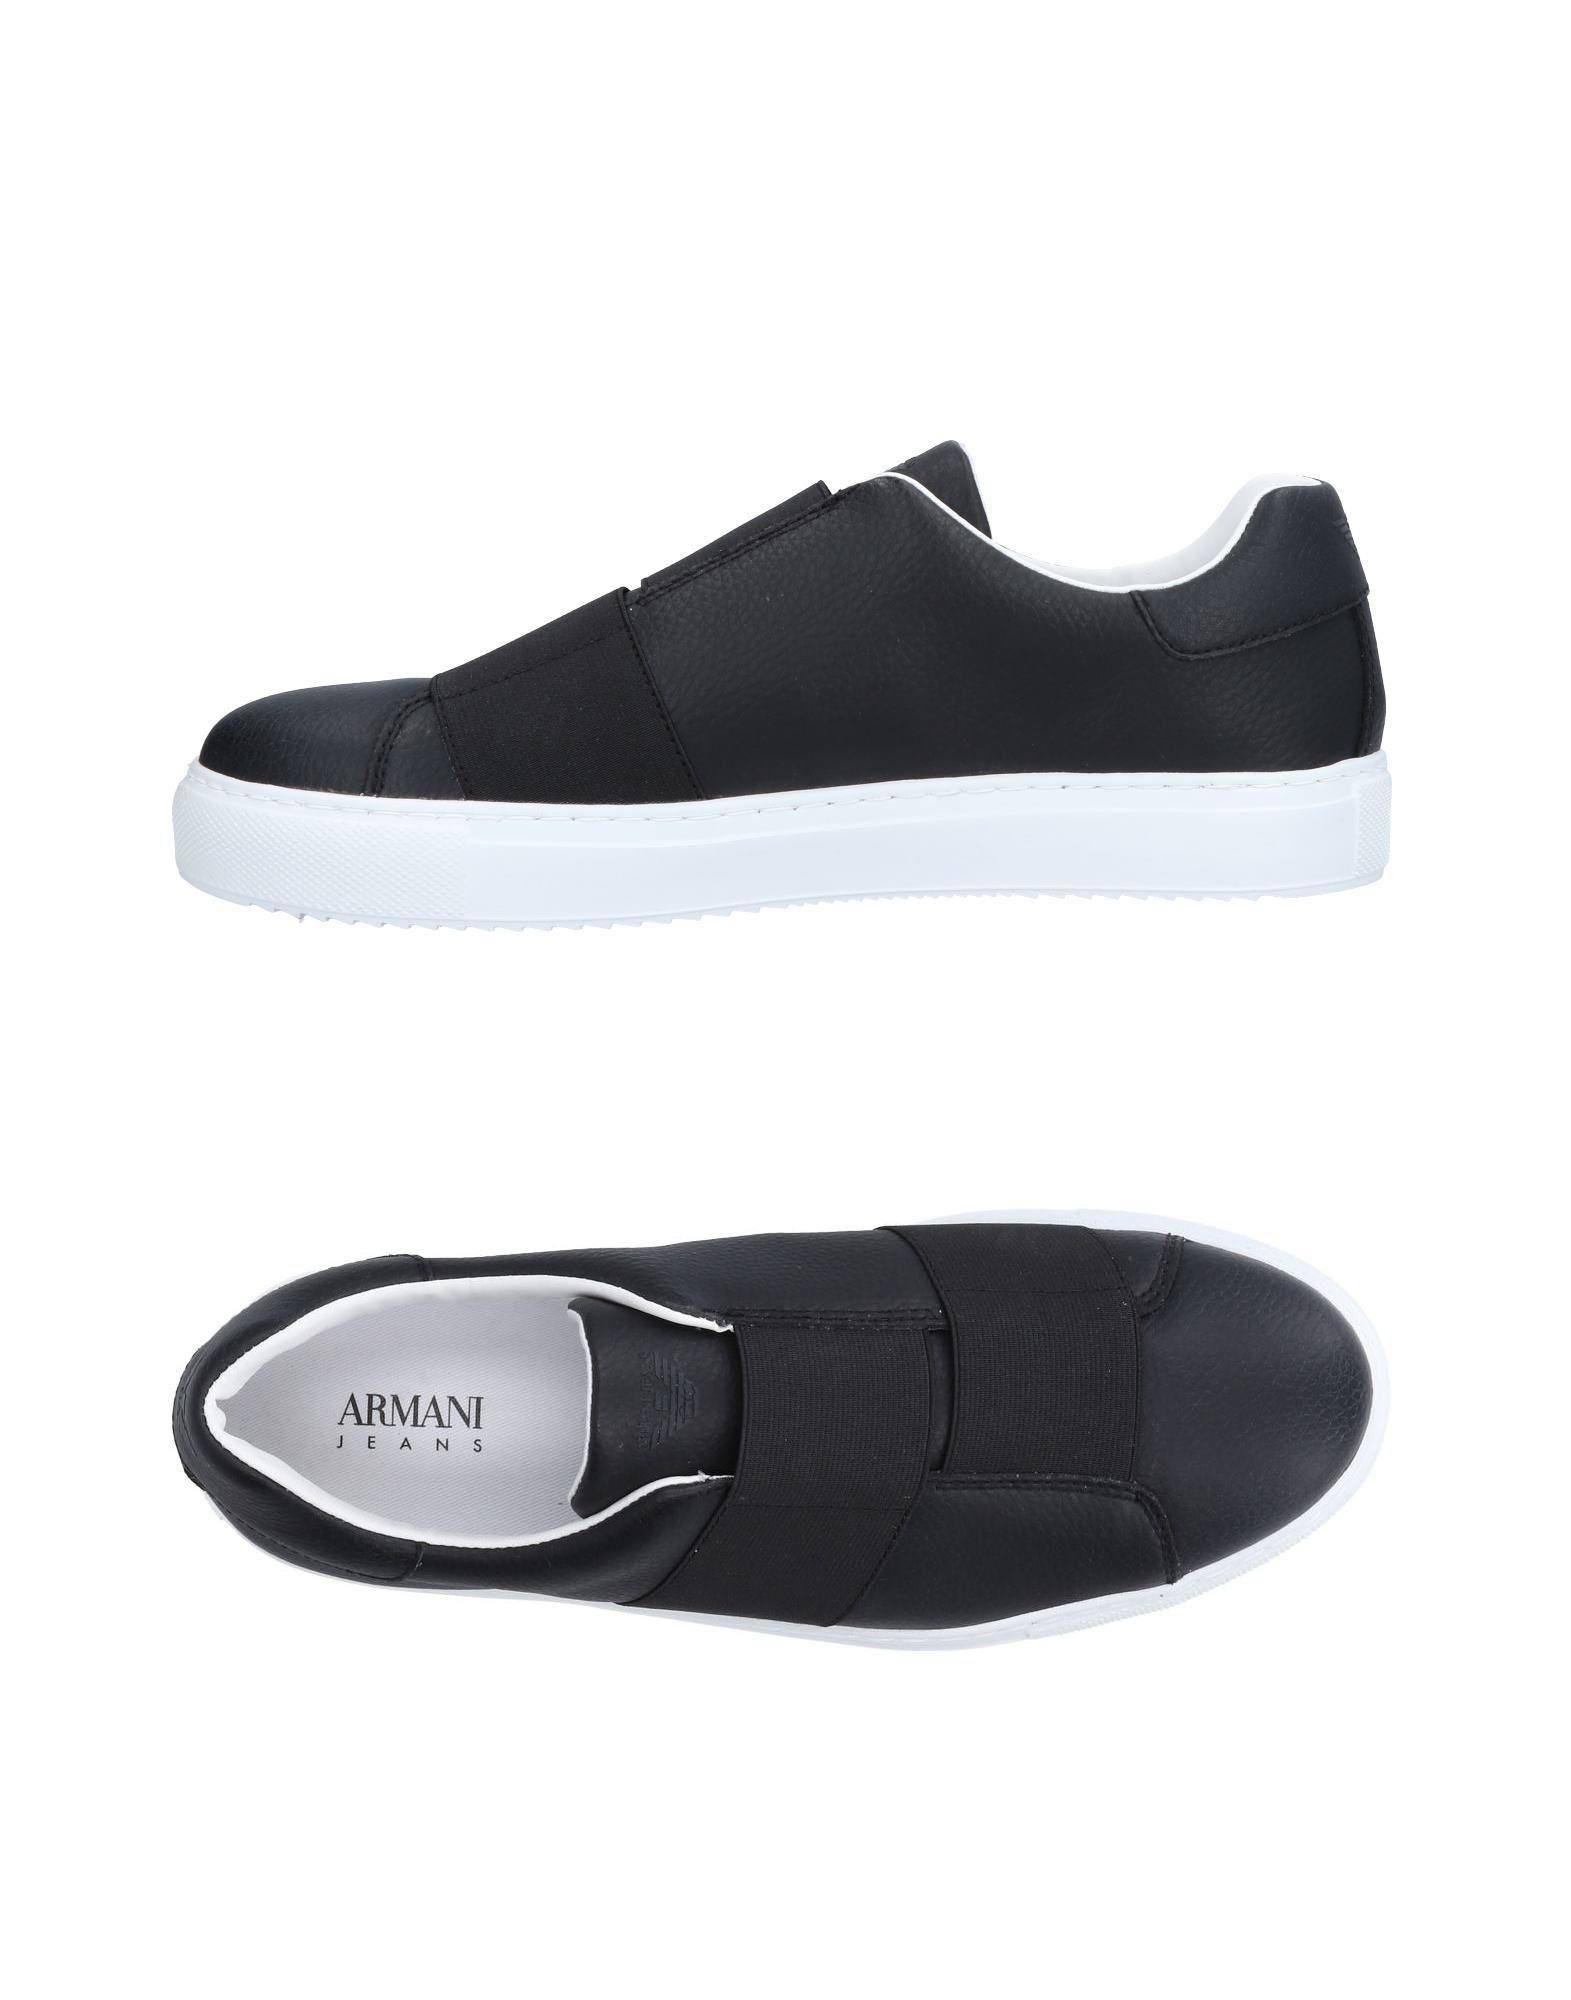 Armani Jeans Sneakers - Men Armani Jeans Australia Sneakers online on  Australia Jeans - 11511413JM 7b5c84